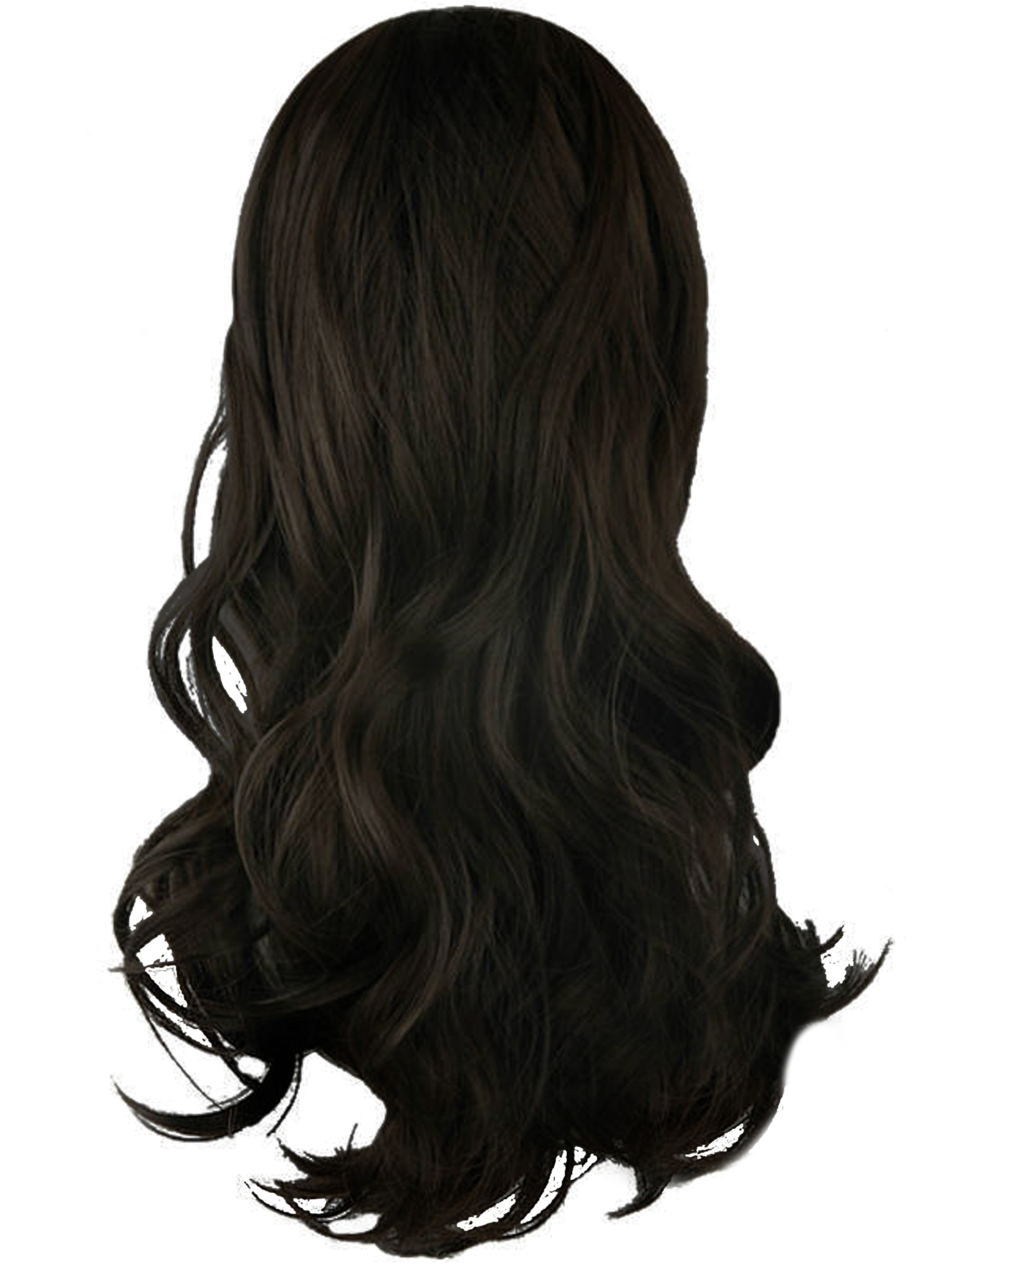 Women hair PNG image - Hair PNG